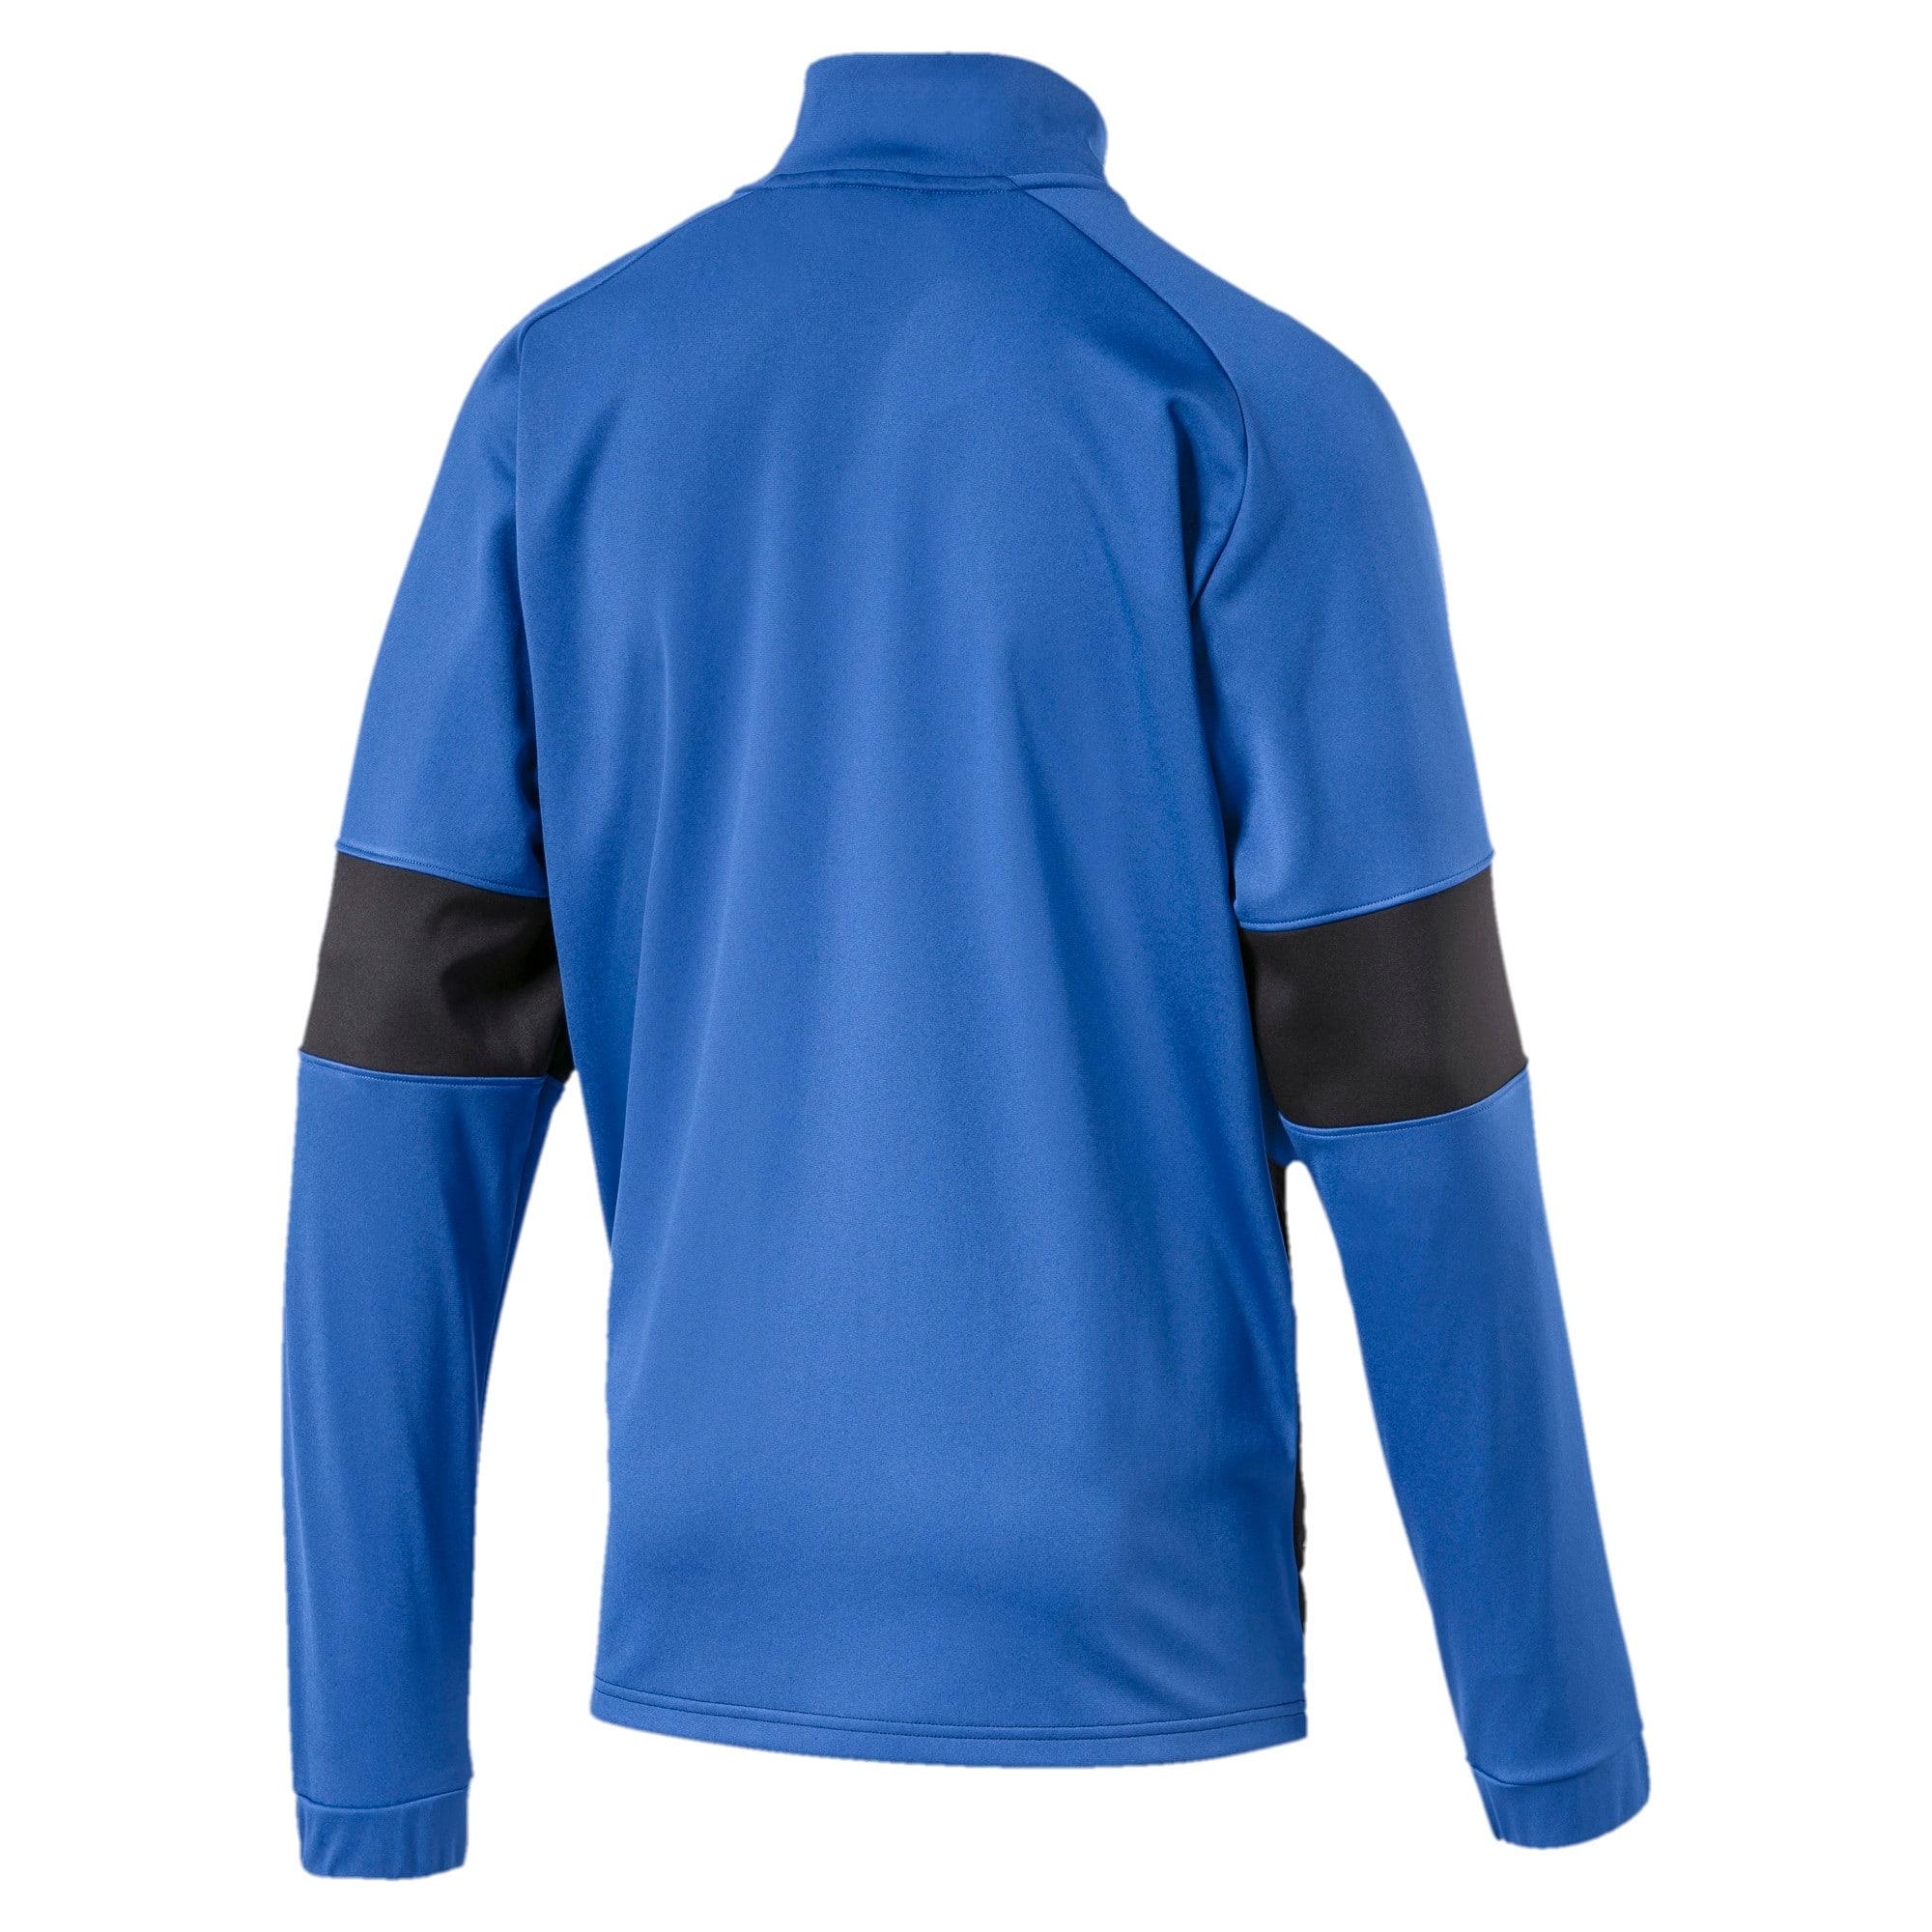 Thumbnail 5 of PUMA Blaster Men's Jacket, Galaxy Blue-Puma Black, medium